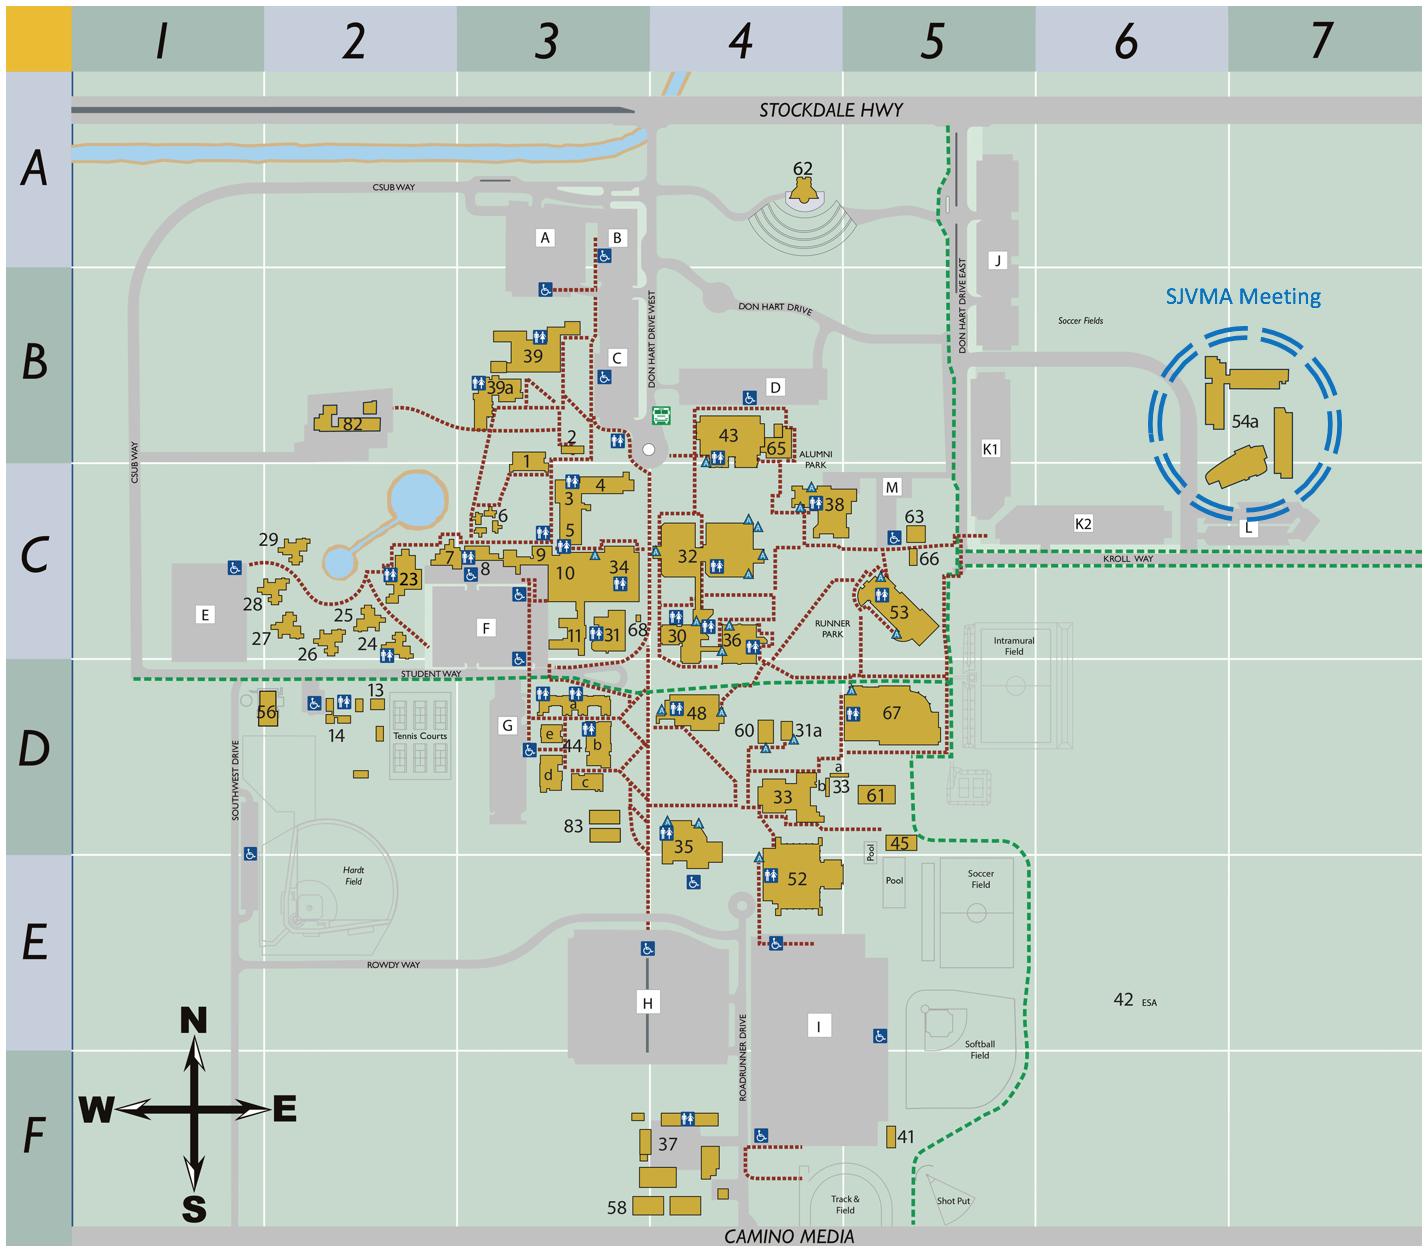 bakersfield_campusmap.png